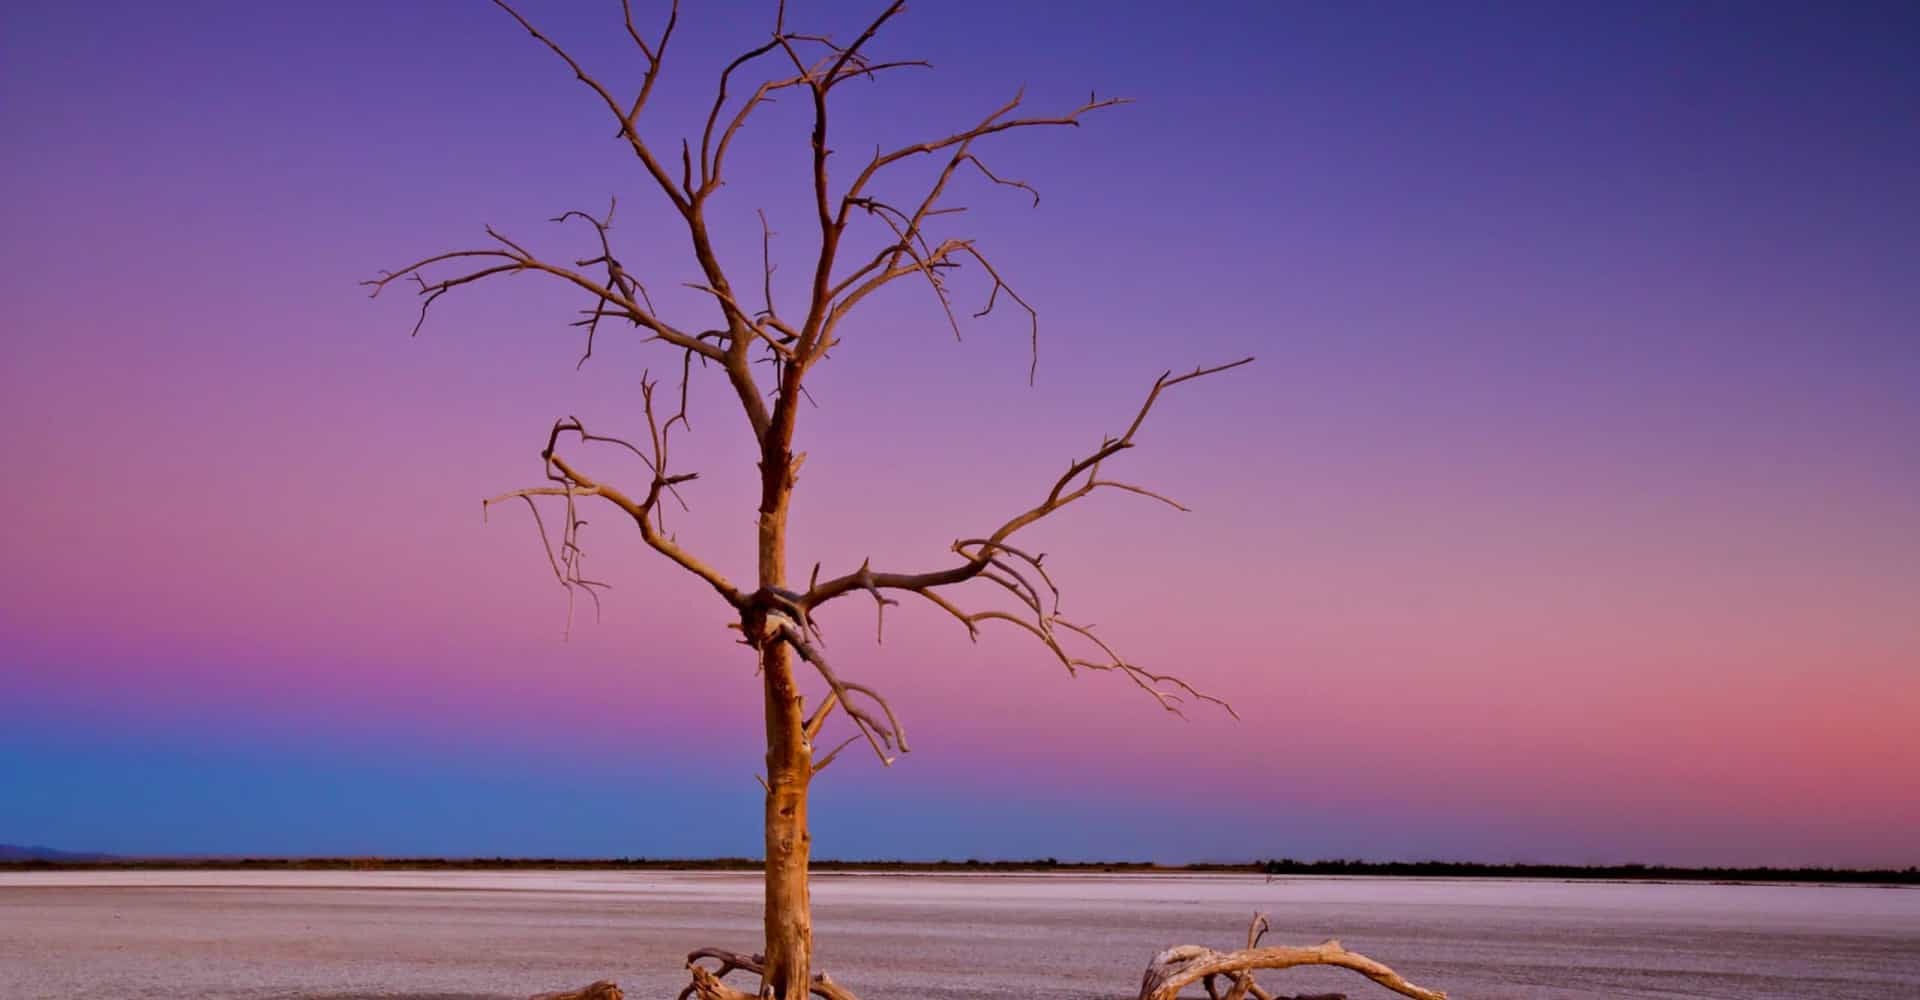 The Salton Sea: from paradise to purgatory